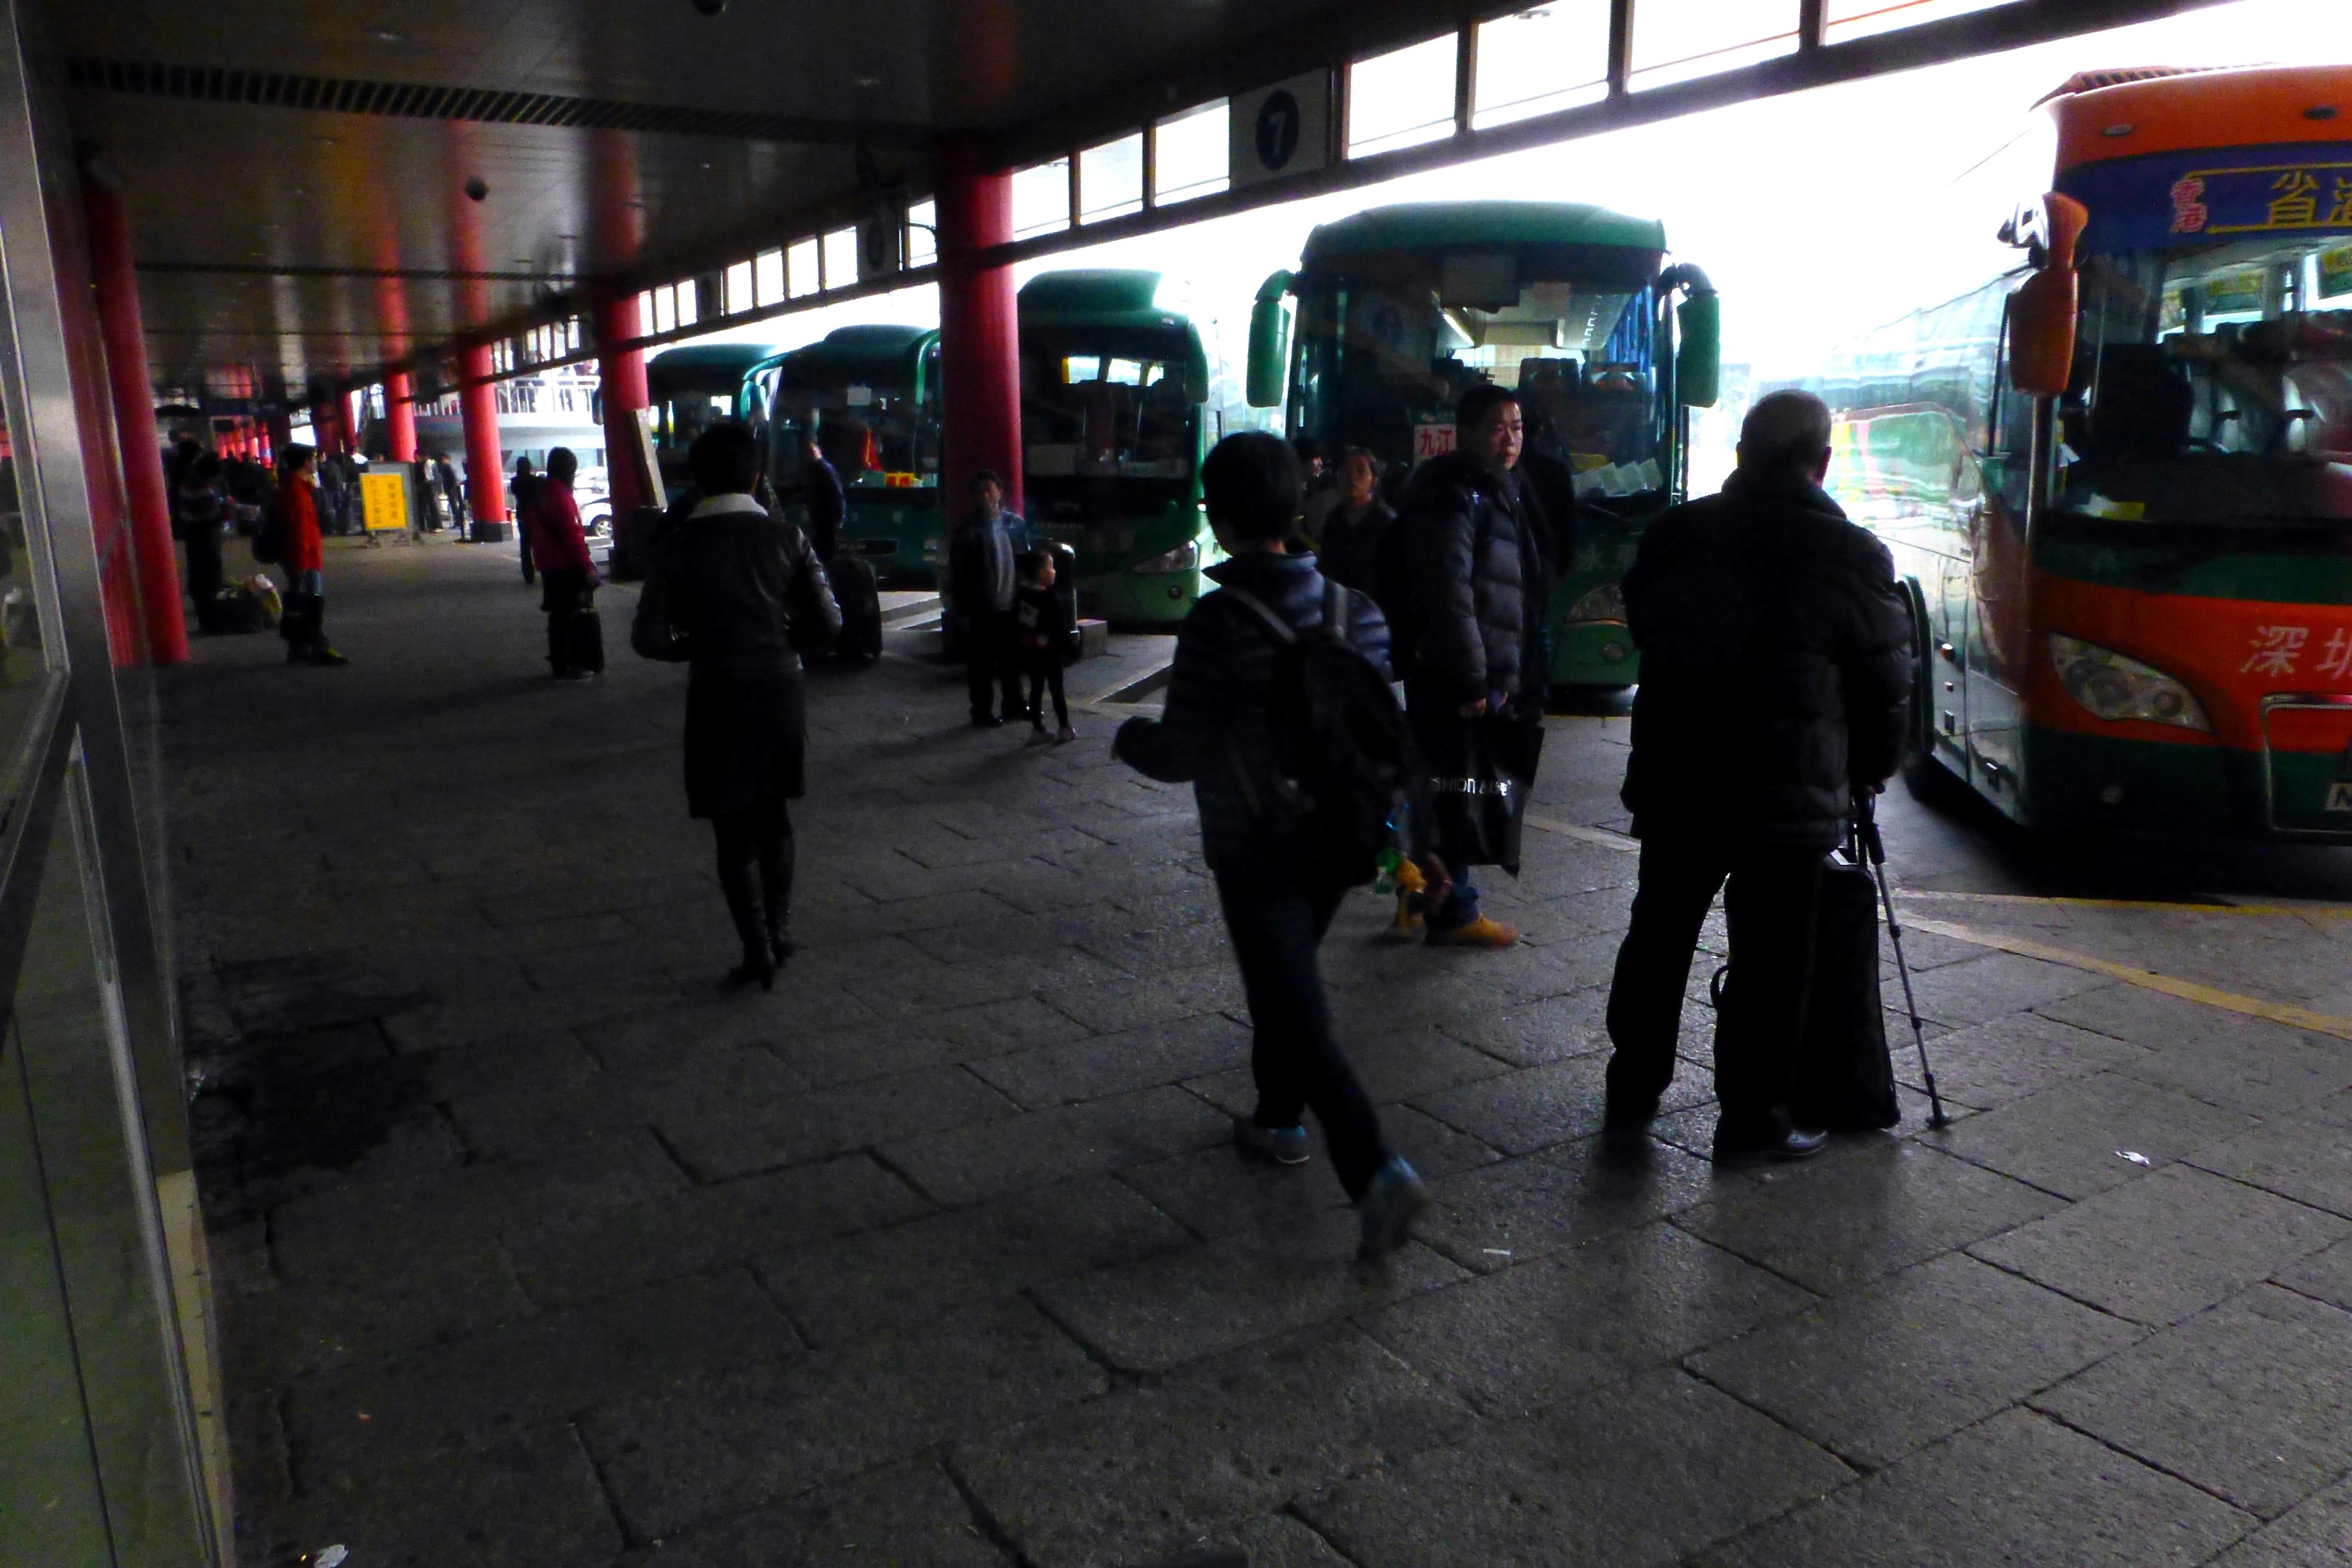 Huanggang Border Crossing Shenzhen China 皇岗口岸 | Explore dcma ...